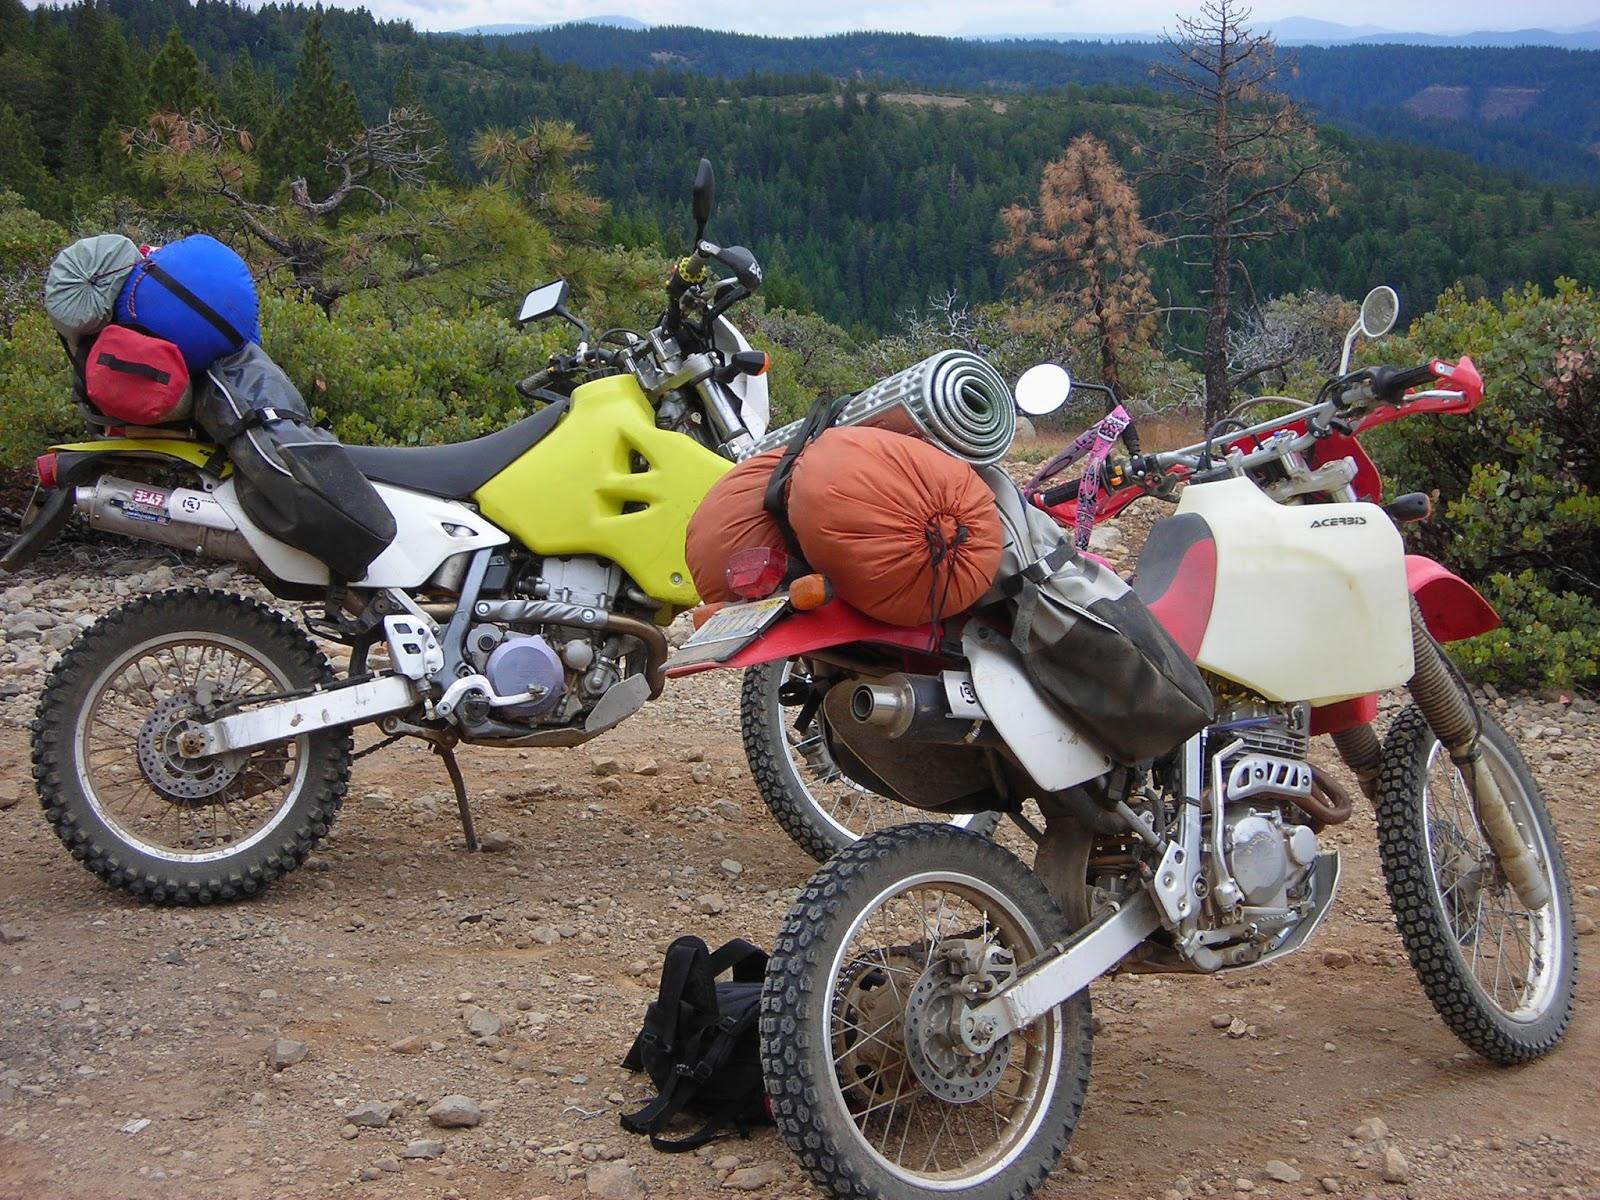 Suzuki Drz400e Specs >> Giant Loop Riders: 400+ miles on Suzuki DRZ400S and Honda XR250R with Coyote Saddlebag | Go ...